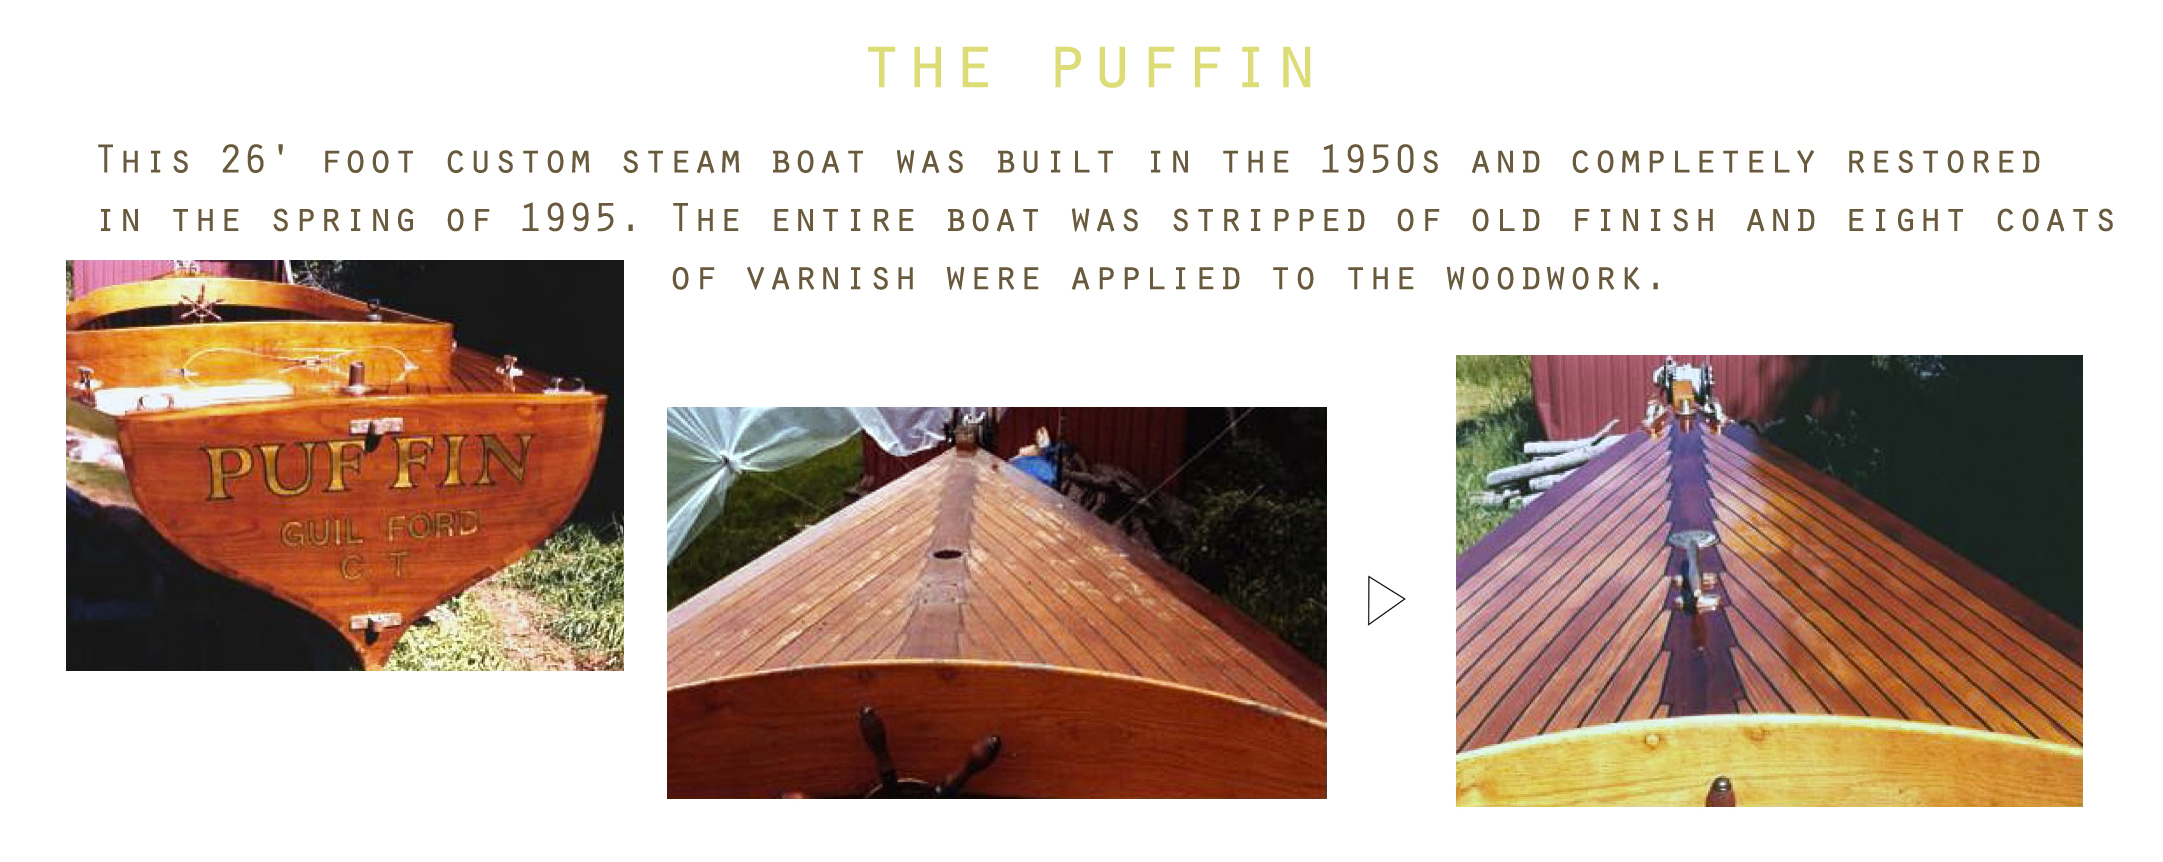 the puffin final 2.jpg